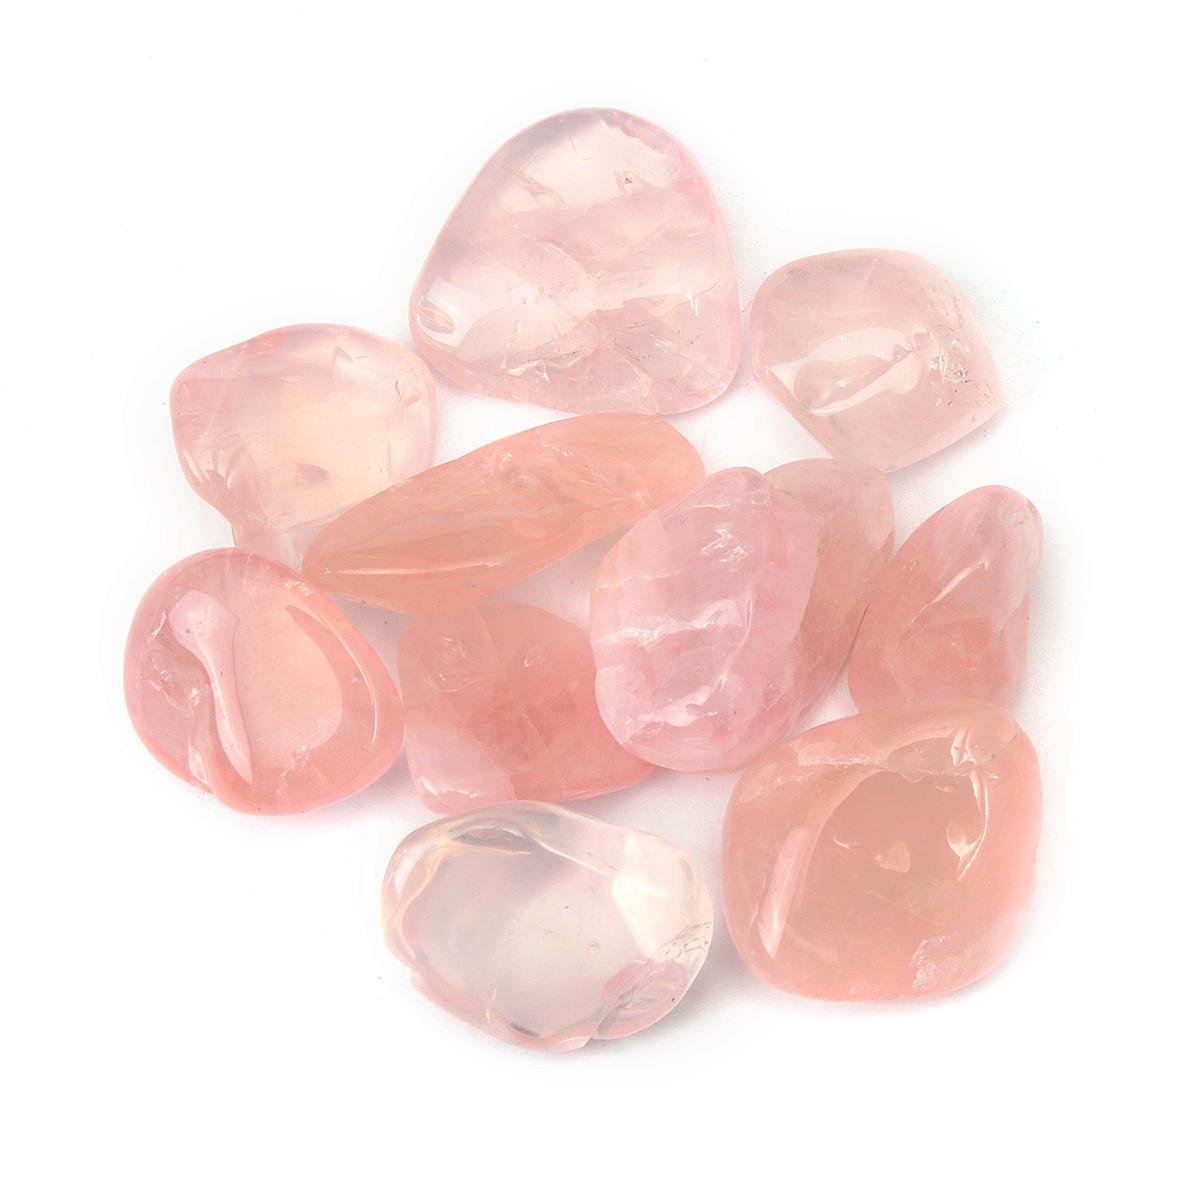 10Pcs Rose Quartz Tumblestones Crystals Stone Polished Healing Specimen Decorations